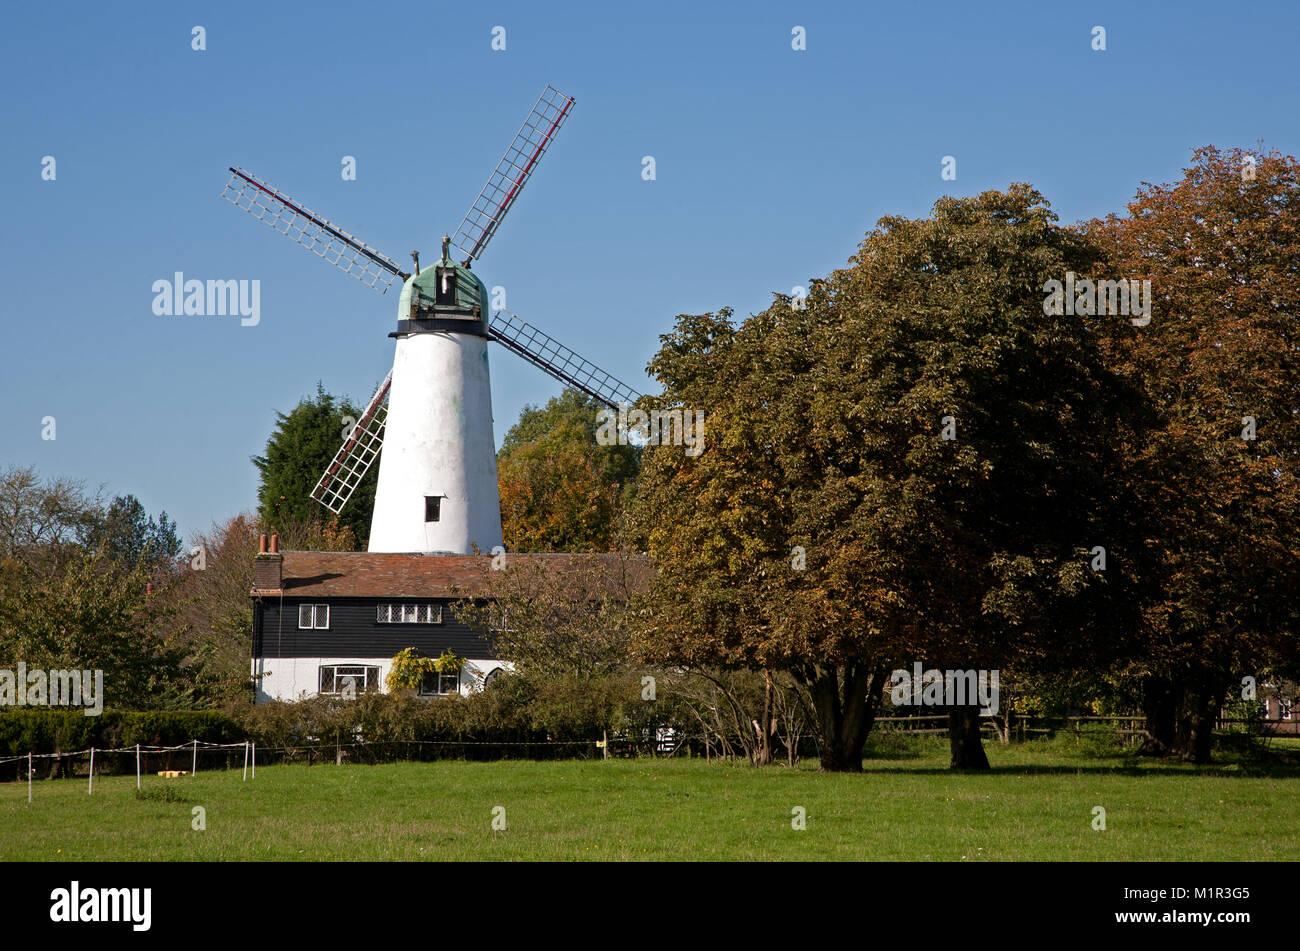 Hawridge Windmill, also known as Cholesbury Windmill, is a disused tower mill in Hawridge, Buckinghamshire, England. - Stock Image